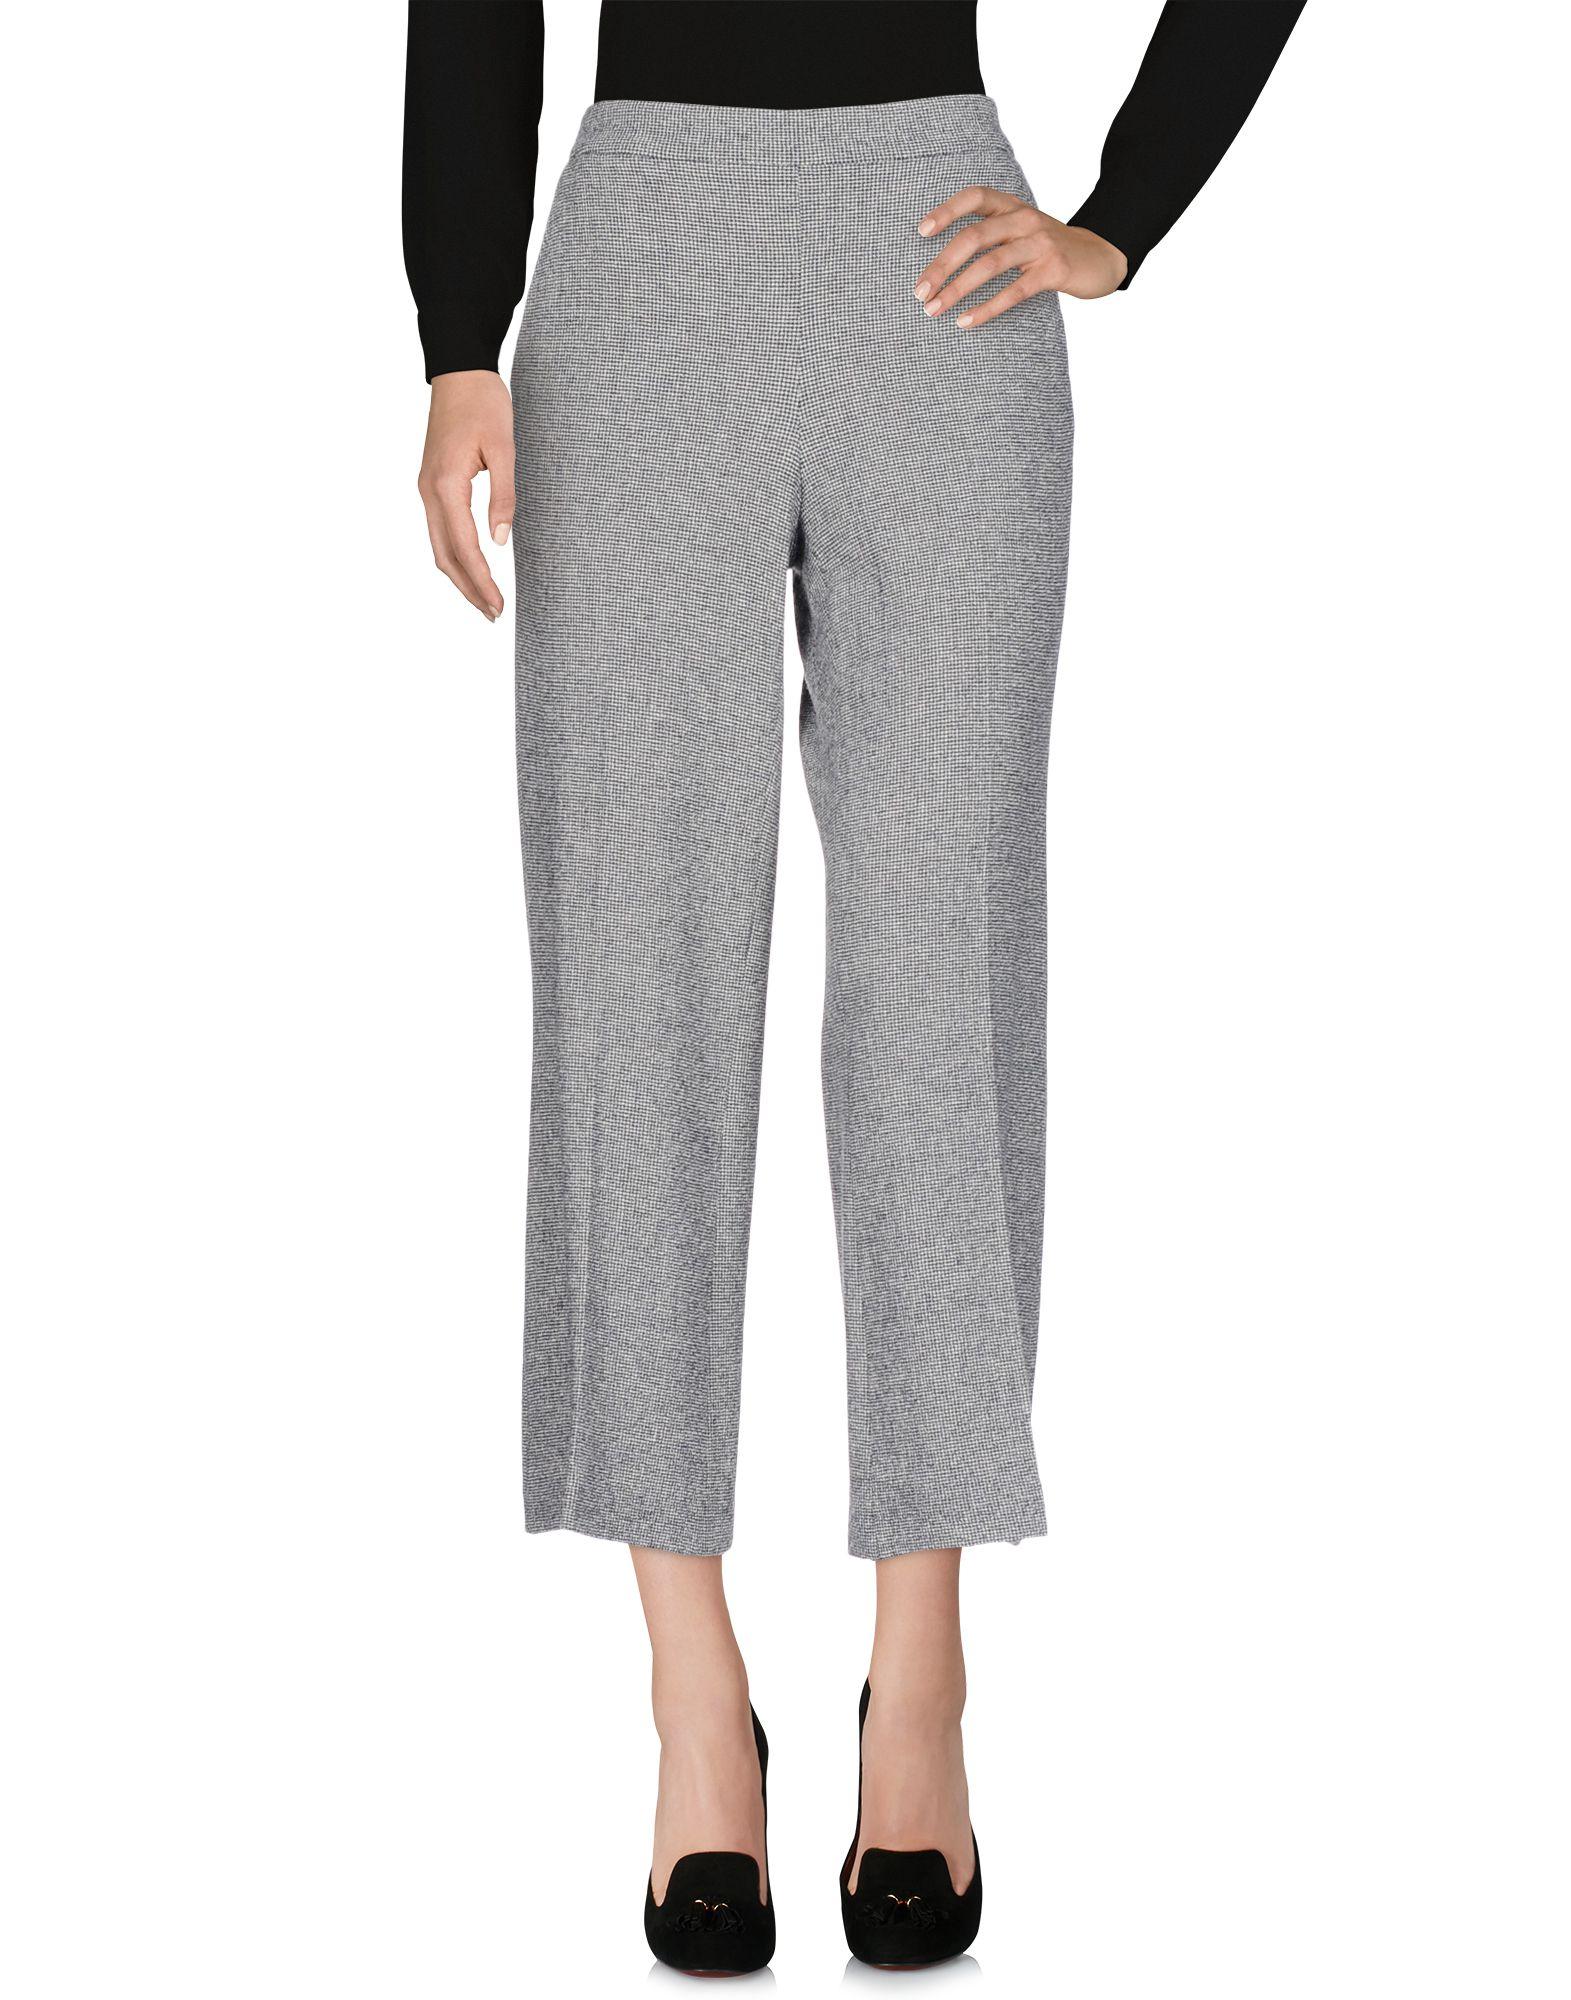 Pantalone Classico Rose' A Pois Donna - Acquista online su vW1b5G